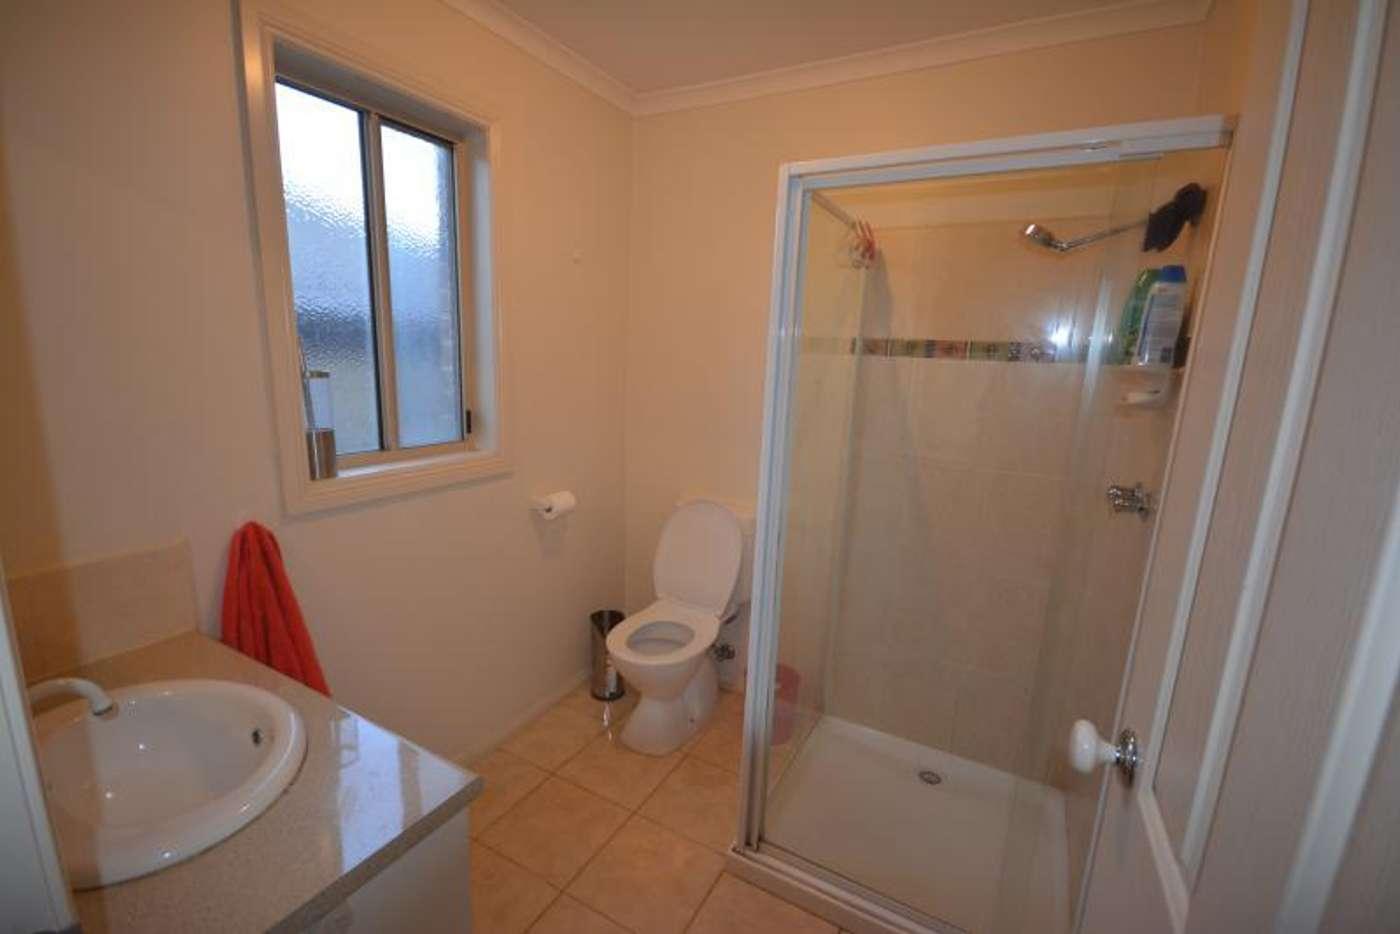 Sixth view of Homely house listing, 14 Jennifer Court, Pakenham VIC 3810